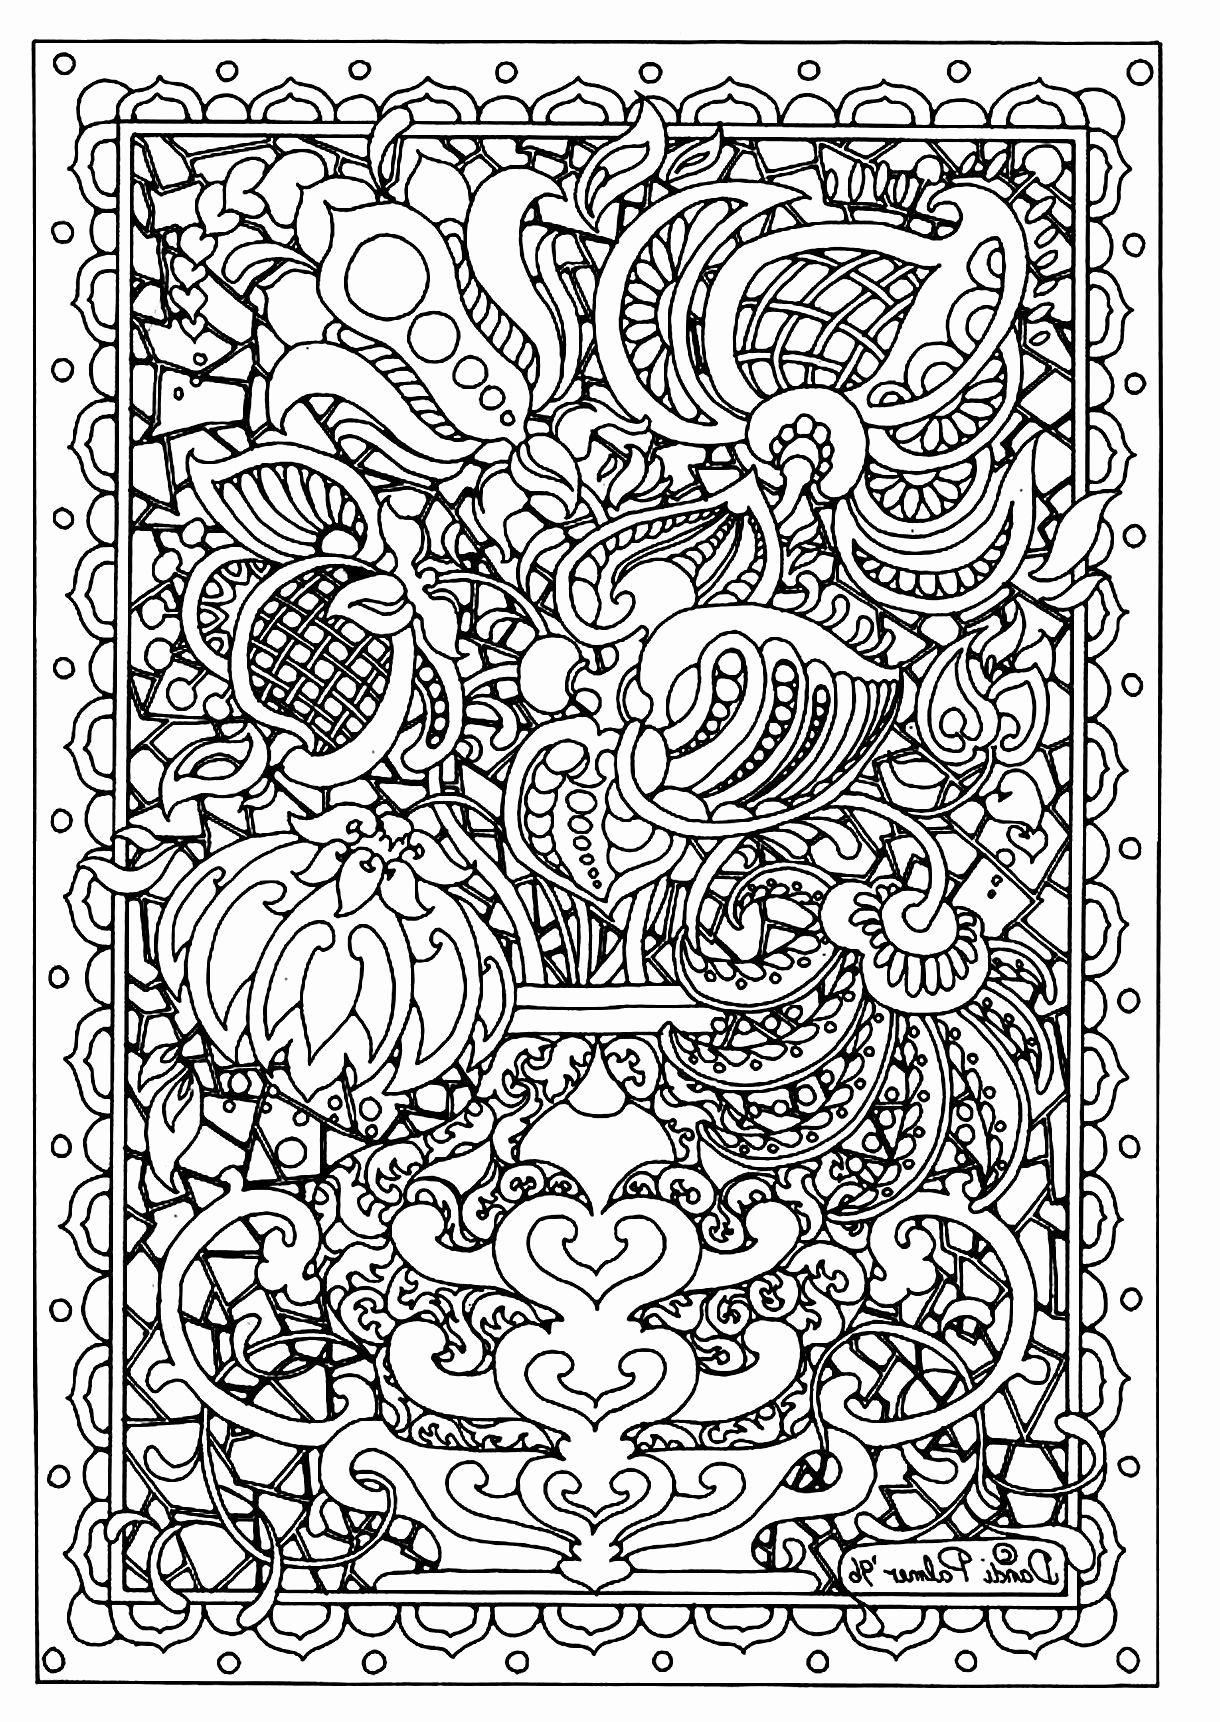 Coloriage Difficile Paysage.Coloriage Mandala Difficile Paysage Coloriage Difficile A Imprimer